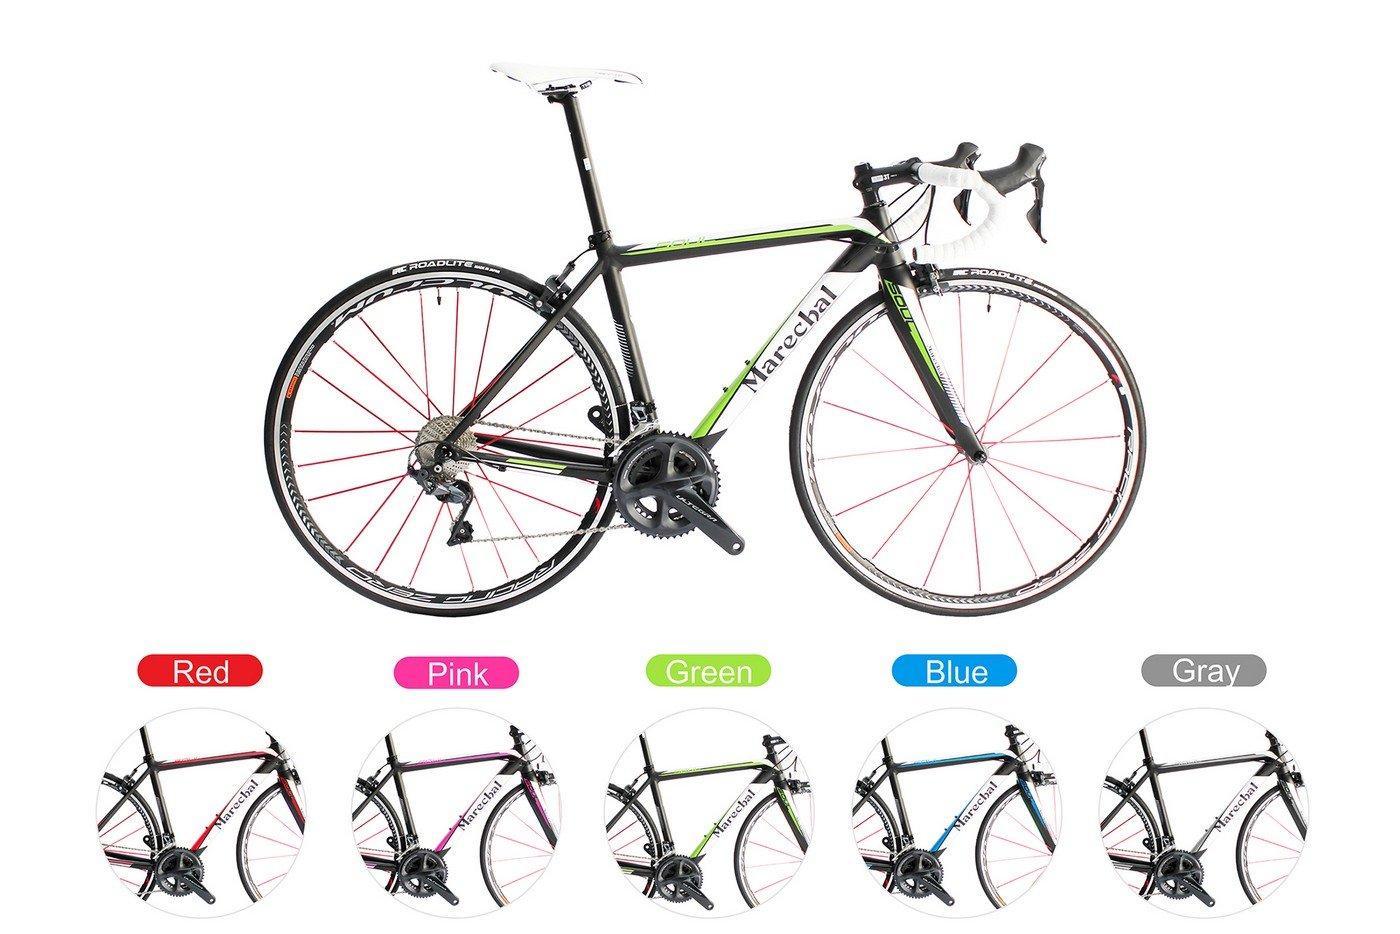 Marechal (マルシャル) Soul Road Bike Bicycle w/R8000 50/34T 170mm & Fulcrum (フルクラム) Racing Zero Red Rim ロードバイク Shimano(シマノ) R8000グループ サイズ 45/47/50/52cmから選択可 [並行輸入品] B07C6LDHBQ 50cm|Blue Blue 50cm